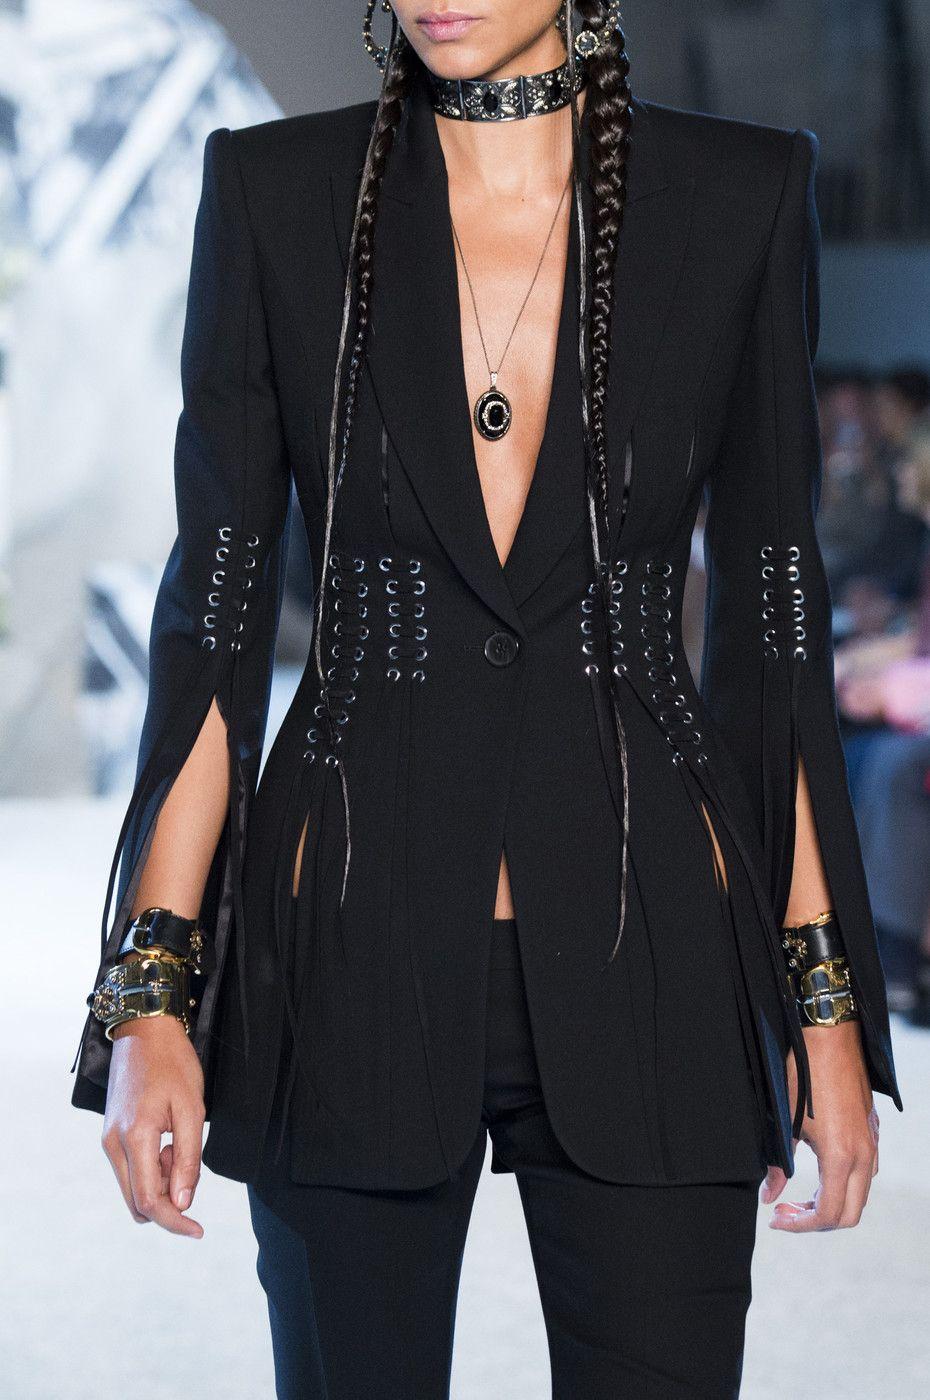 Alexander McQueen at Paris Fashion Week Spring 2019 #fashiondesign